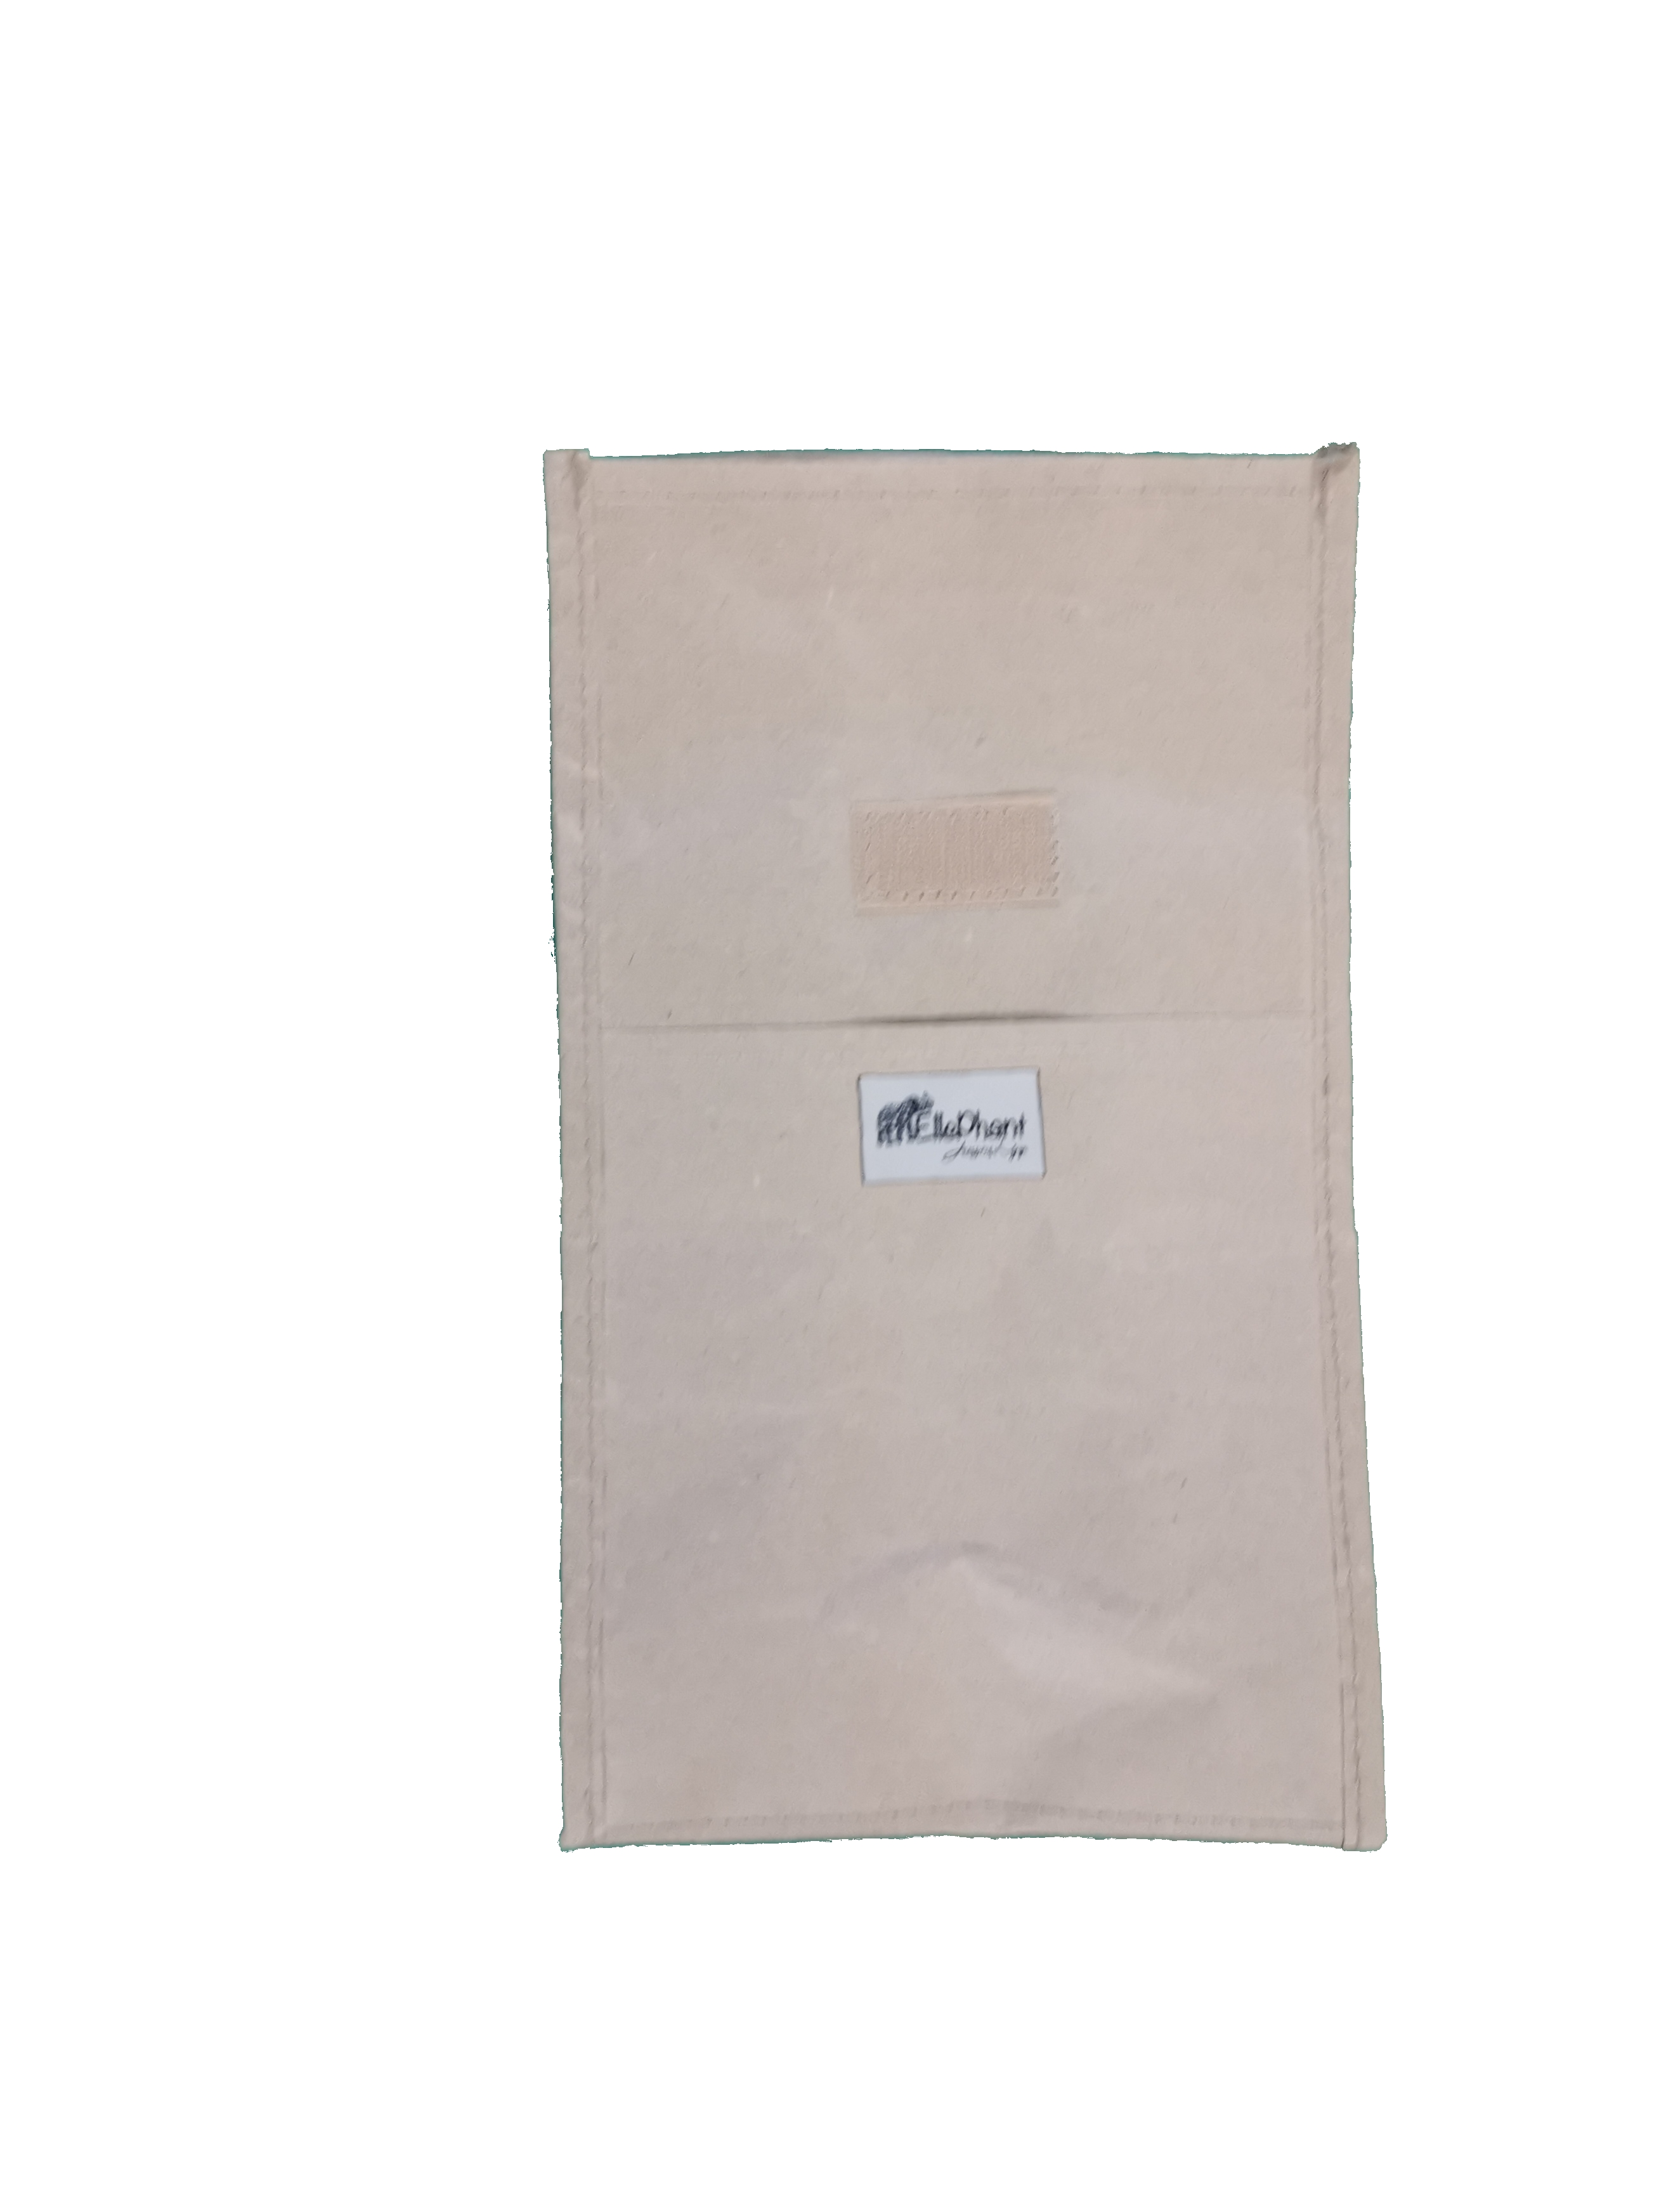 Saco de papel térmico pequeno (32 x 19 cm)